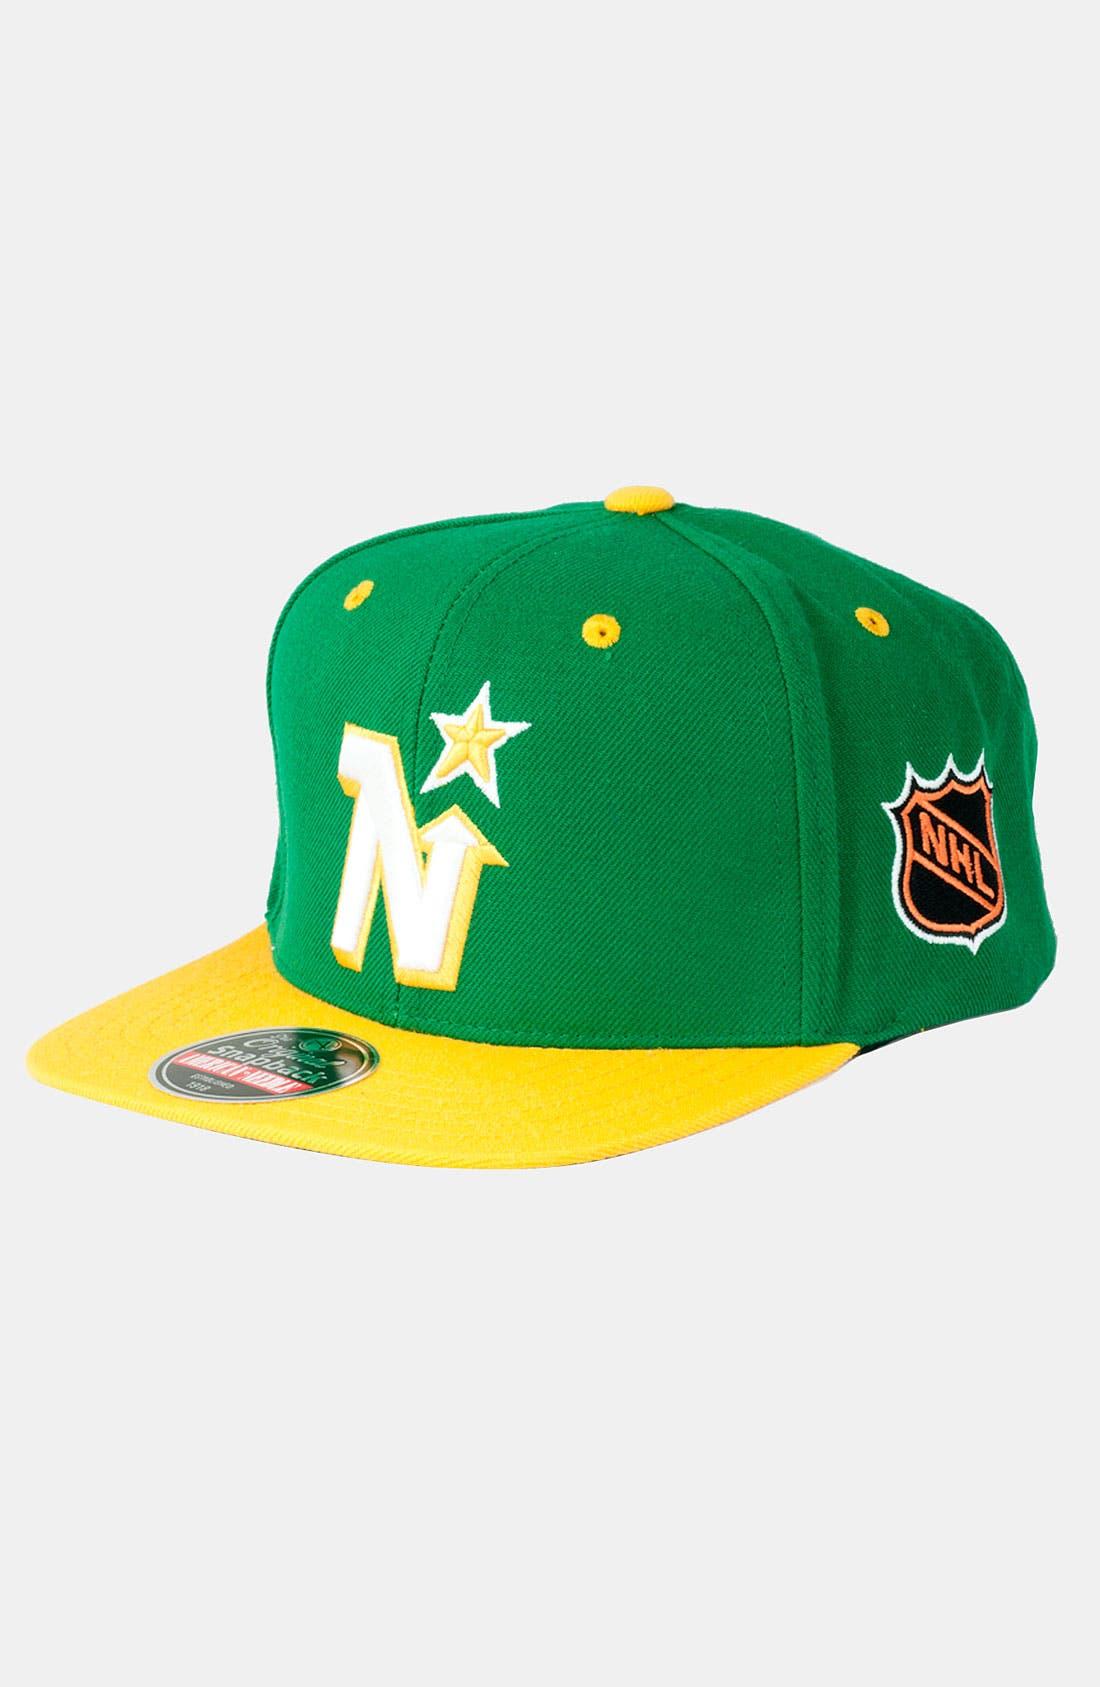 Alternate Image 1 Selected - American Needle 'North Stars - Blockhead' Snapback Baseball Cap